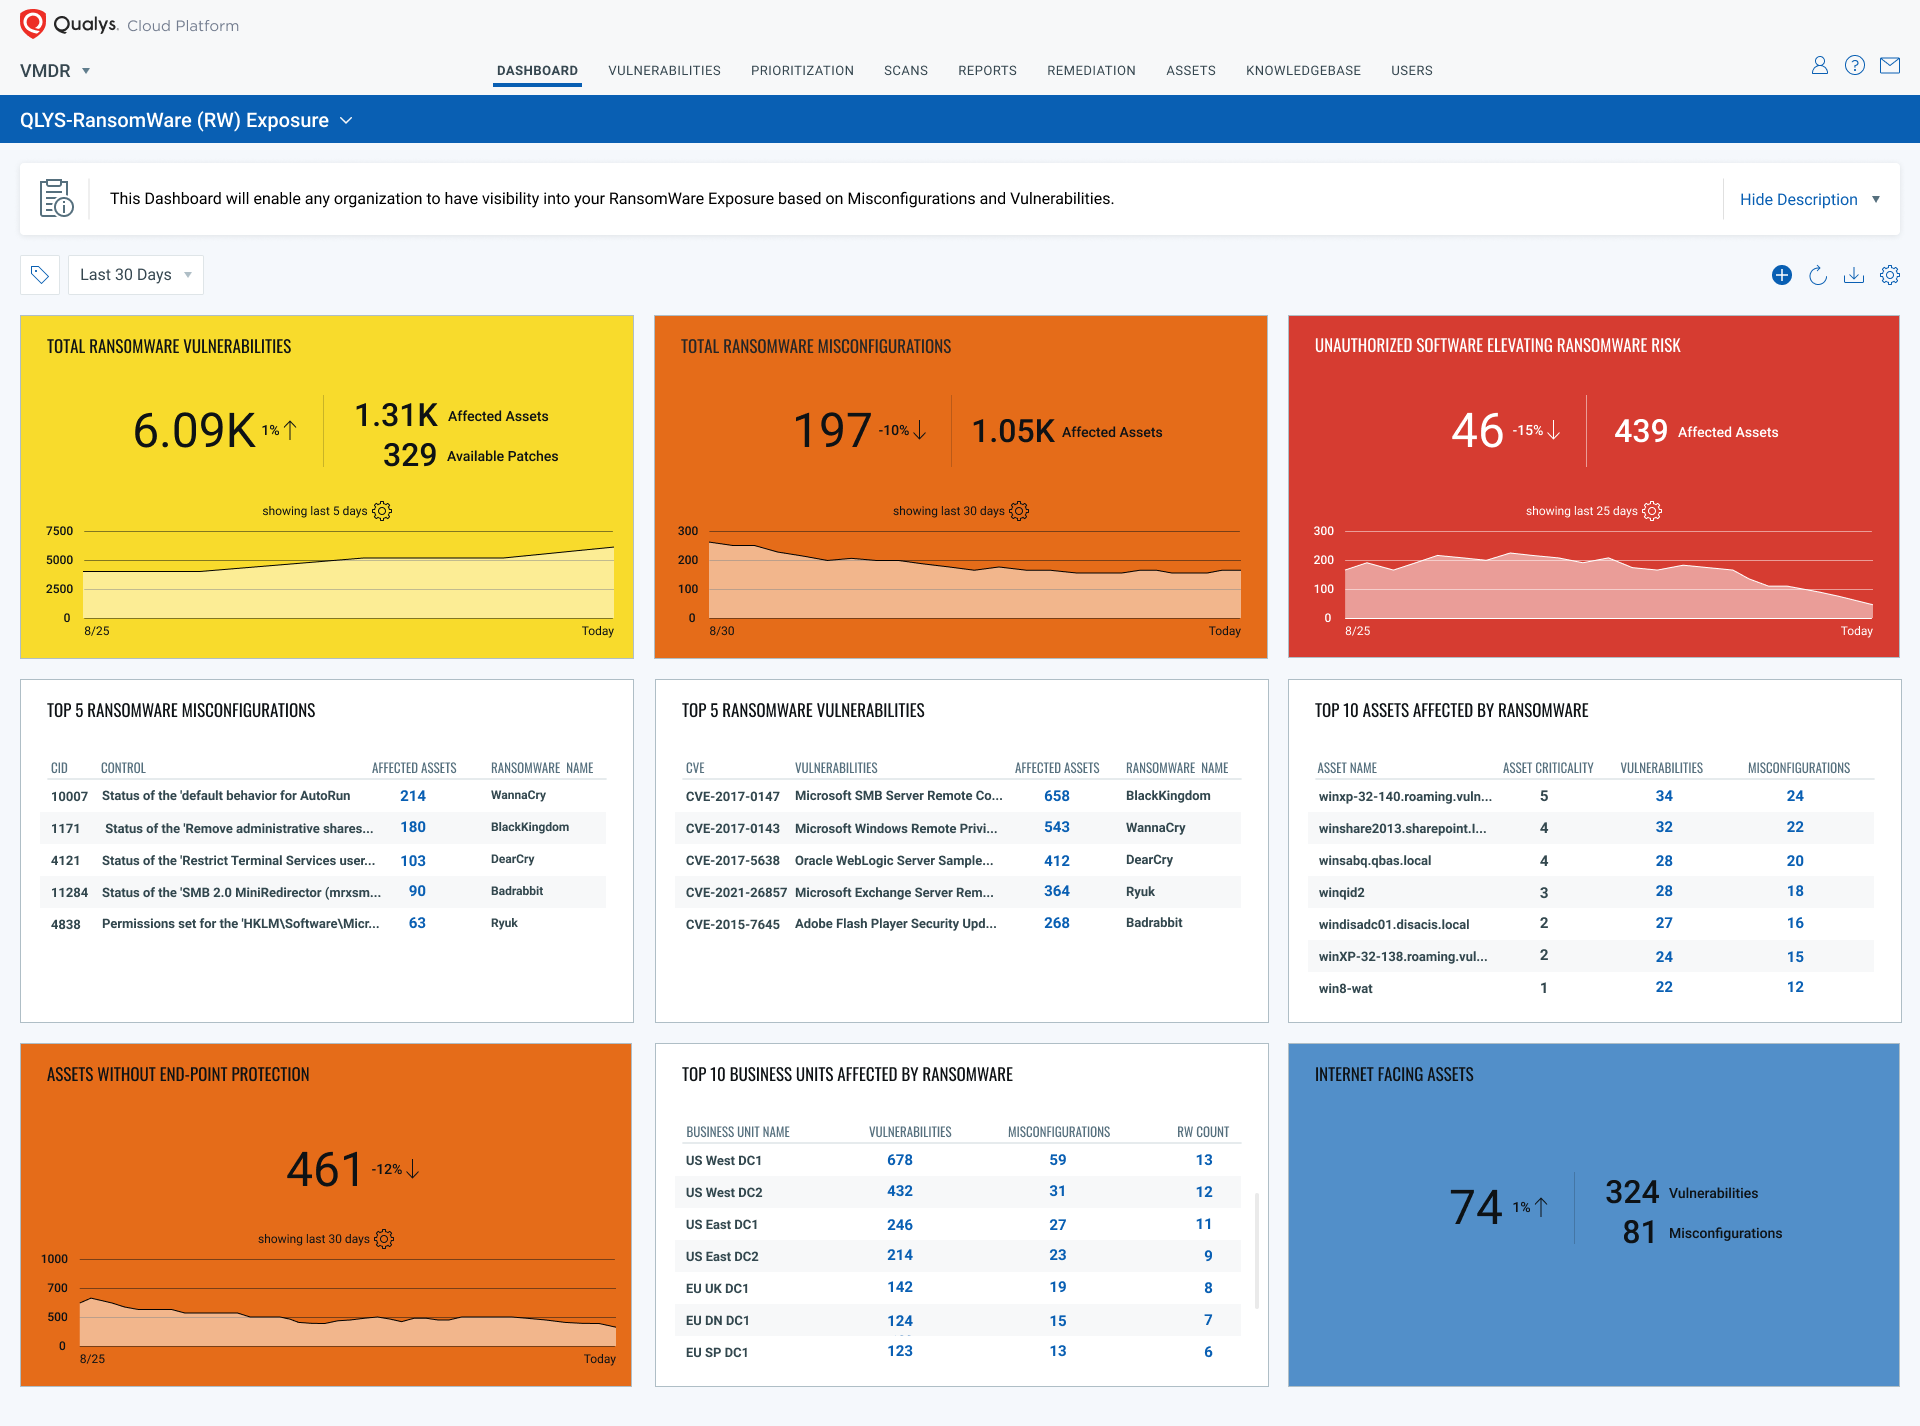 Qualys Ransomware Risk Assessment dashboard